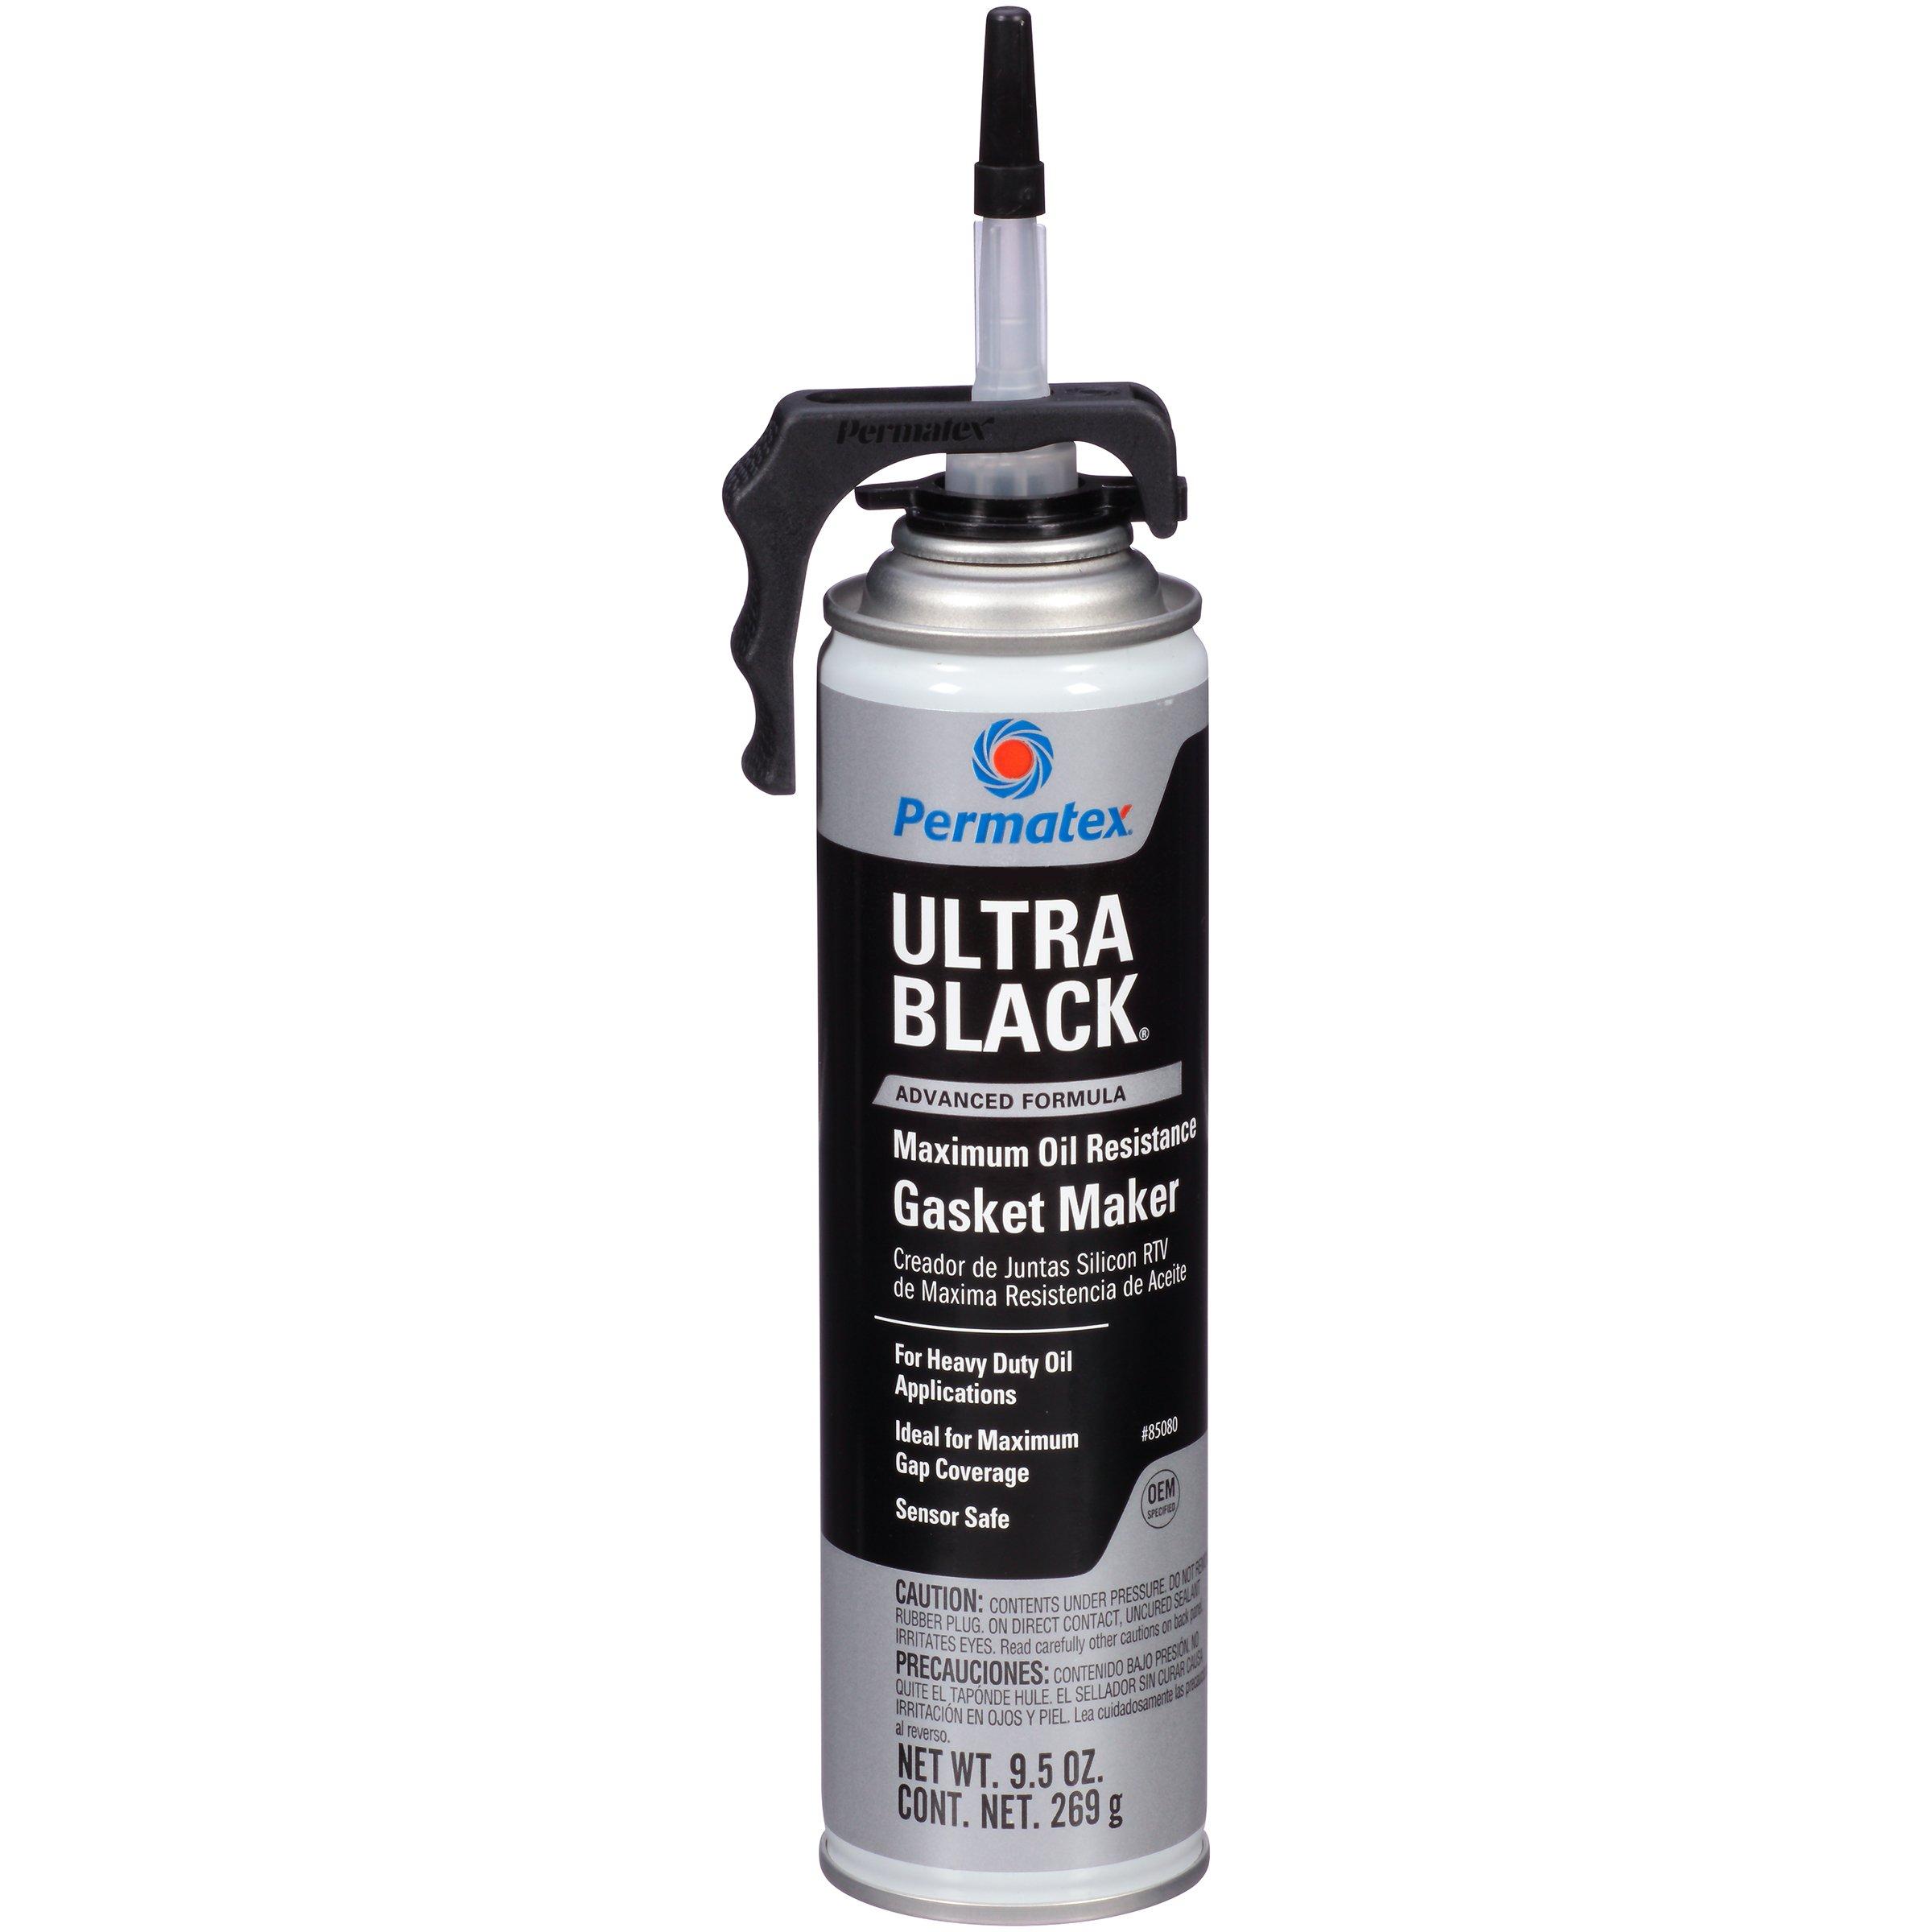 Cheap Rtv Silicone Gasket Maker, find Rtv Silicone Gasket Maker